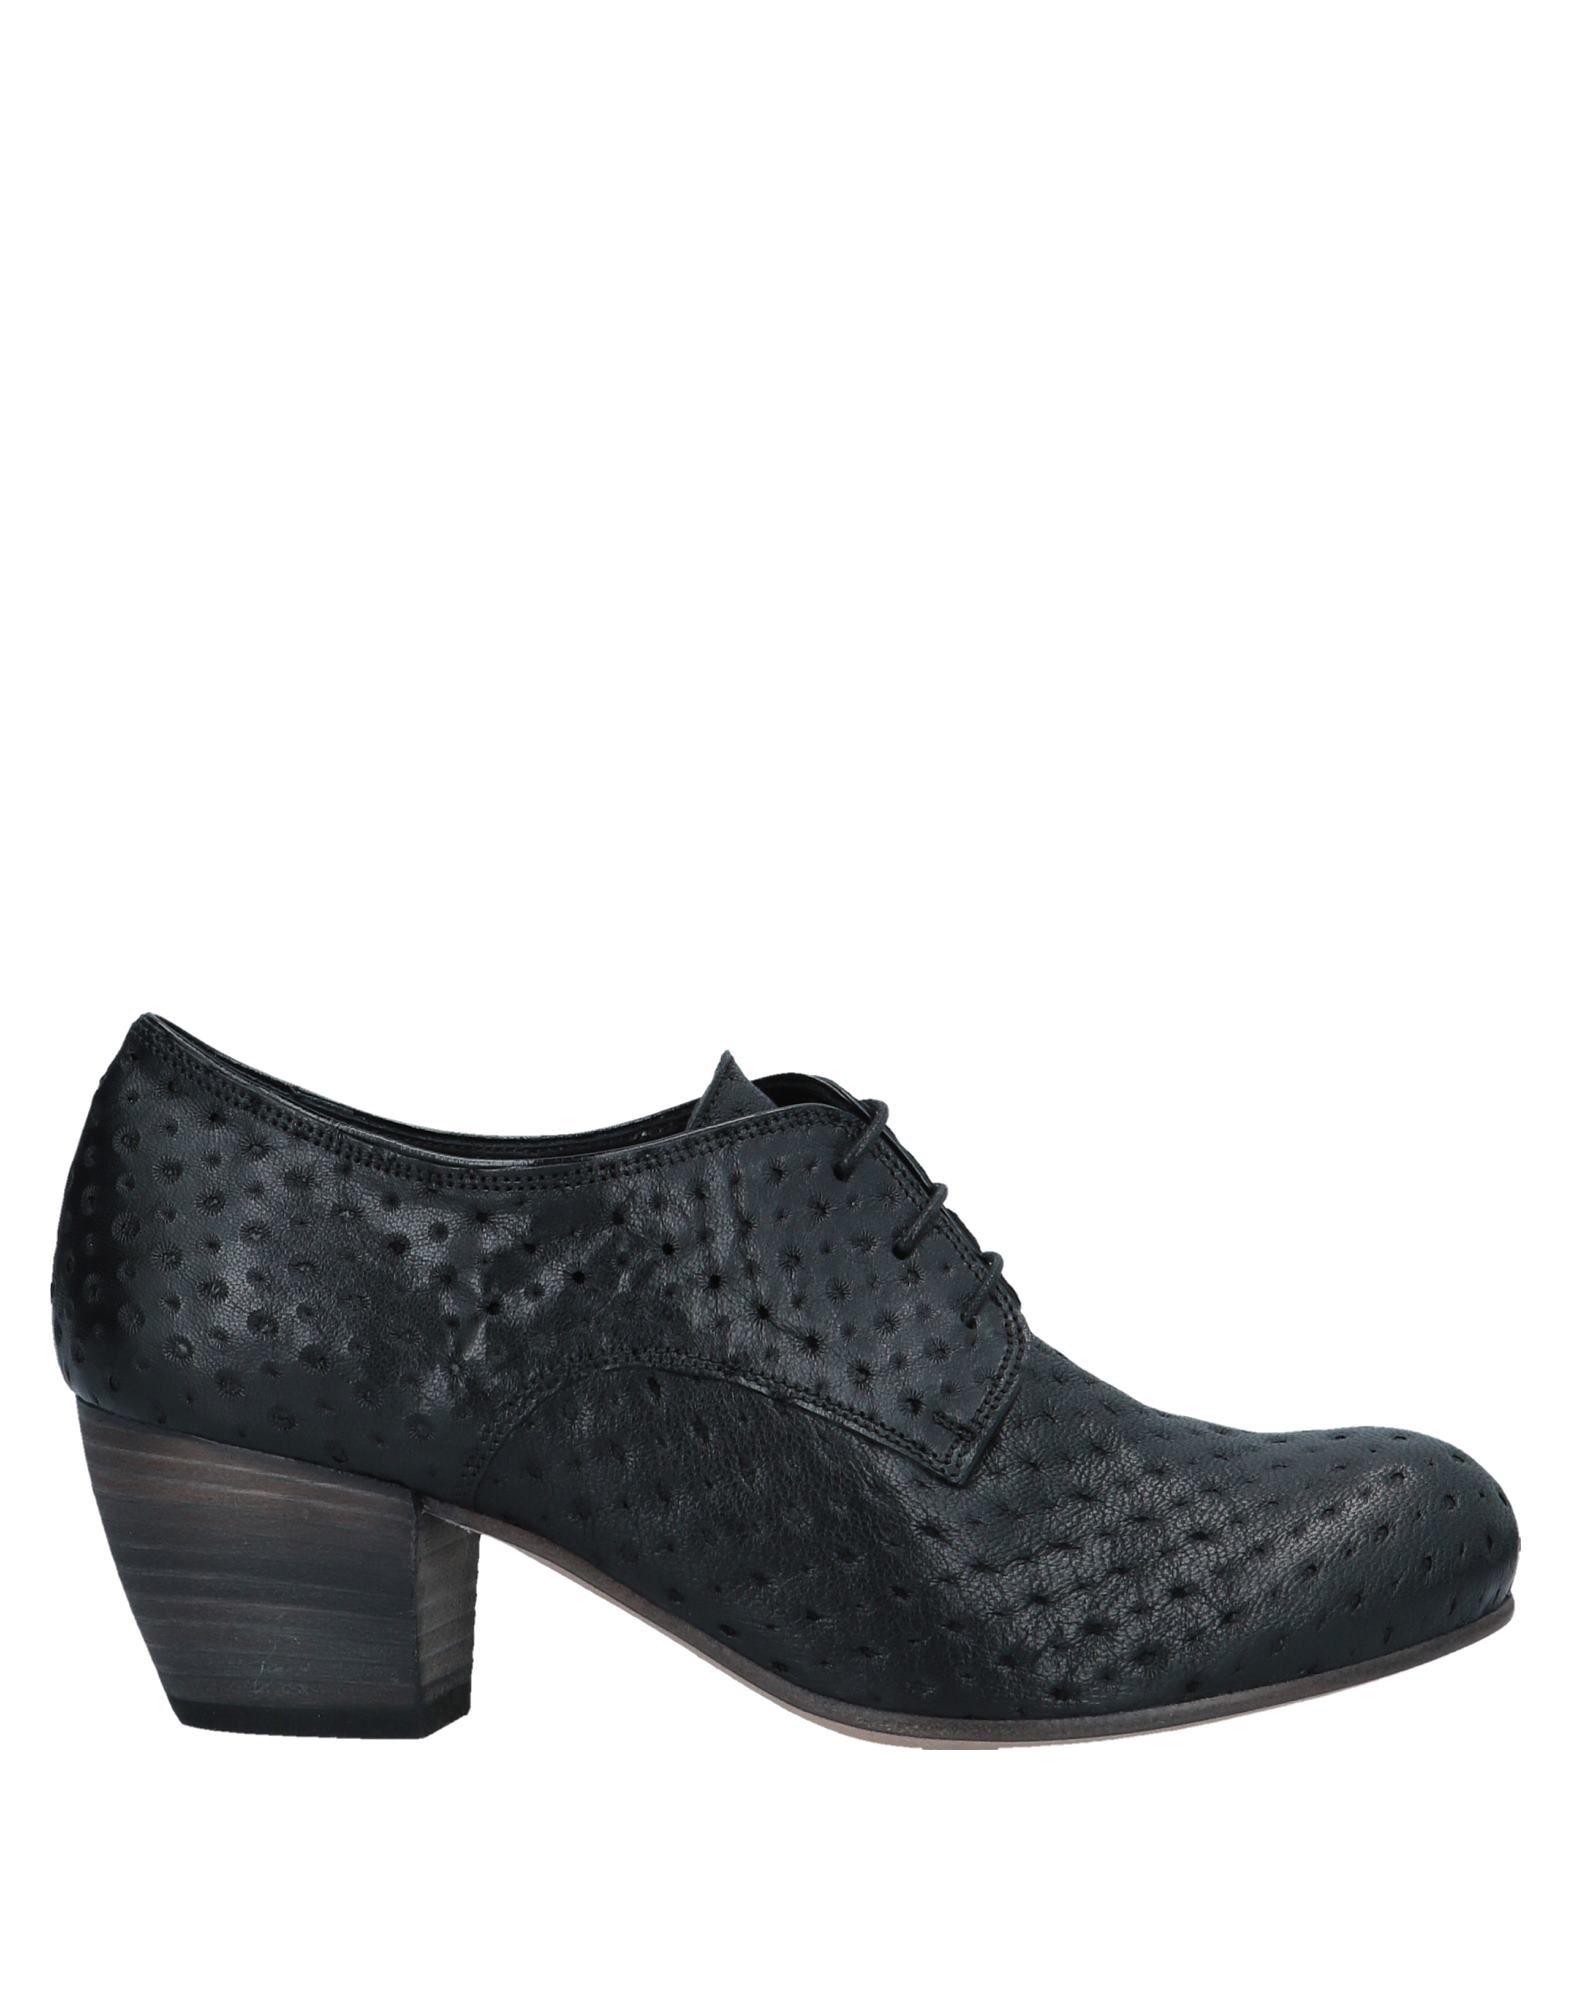 I.N.K. Shoes Обувь на шнурках arsenico shoes обувь на шнурках